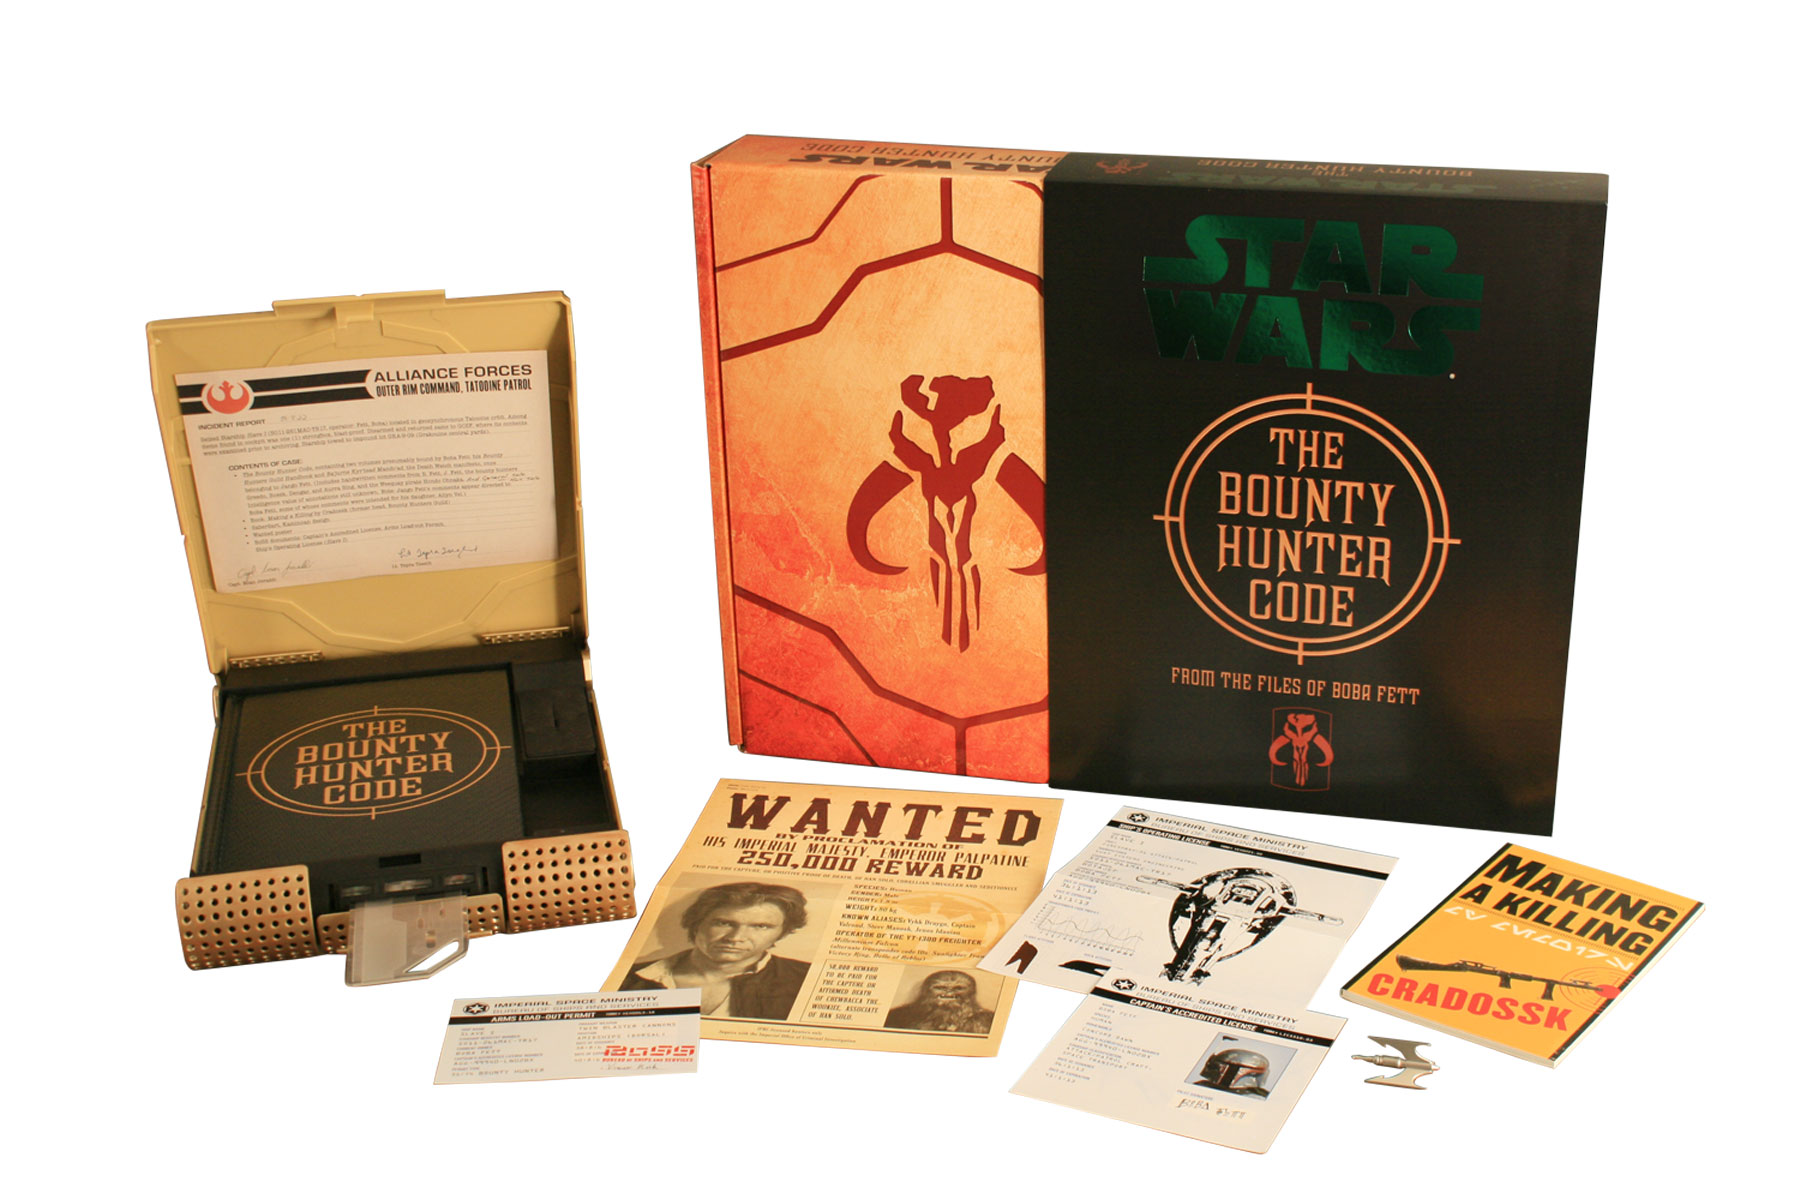 The Bounty Hunter Code